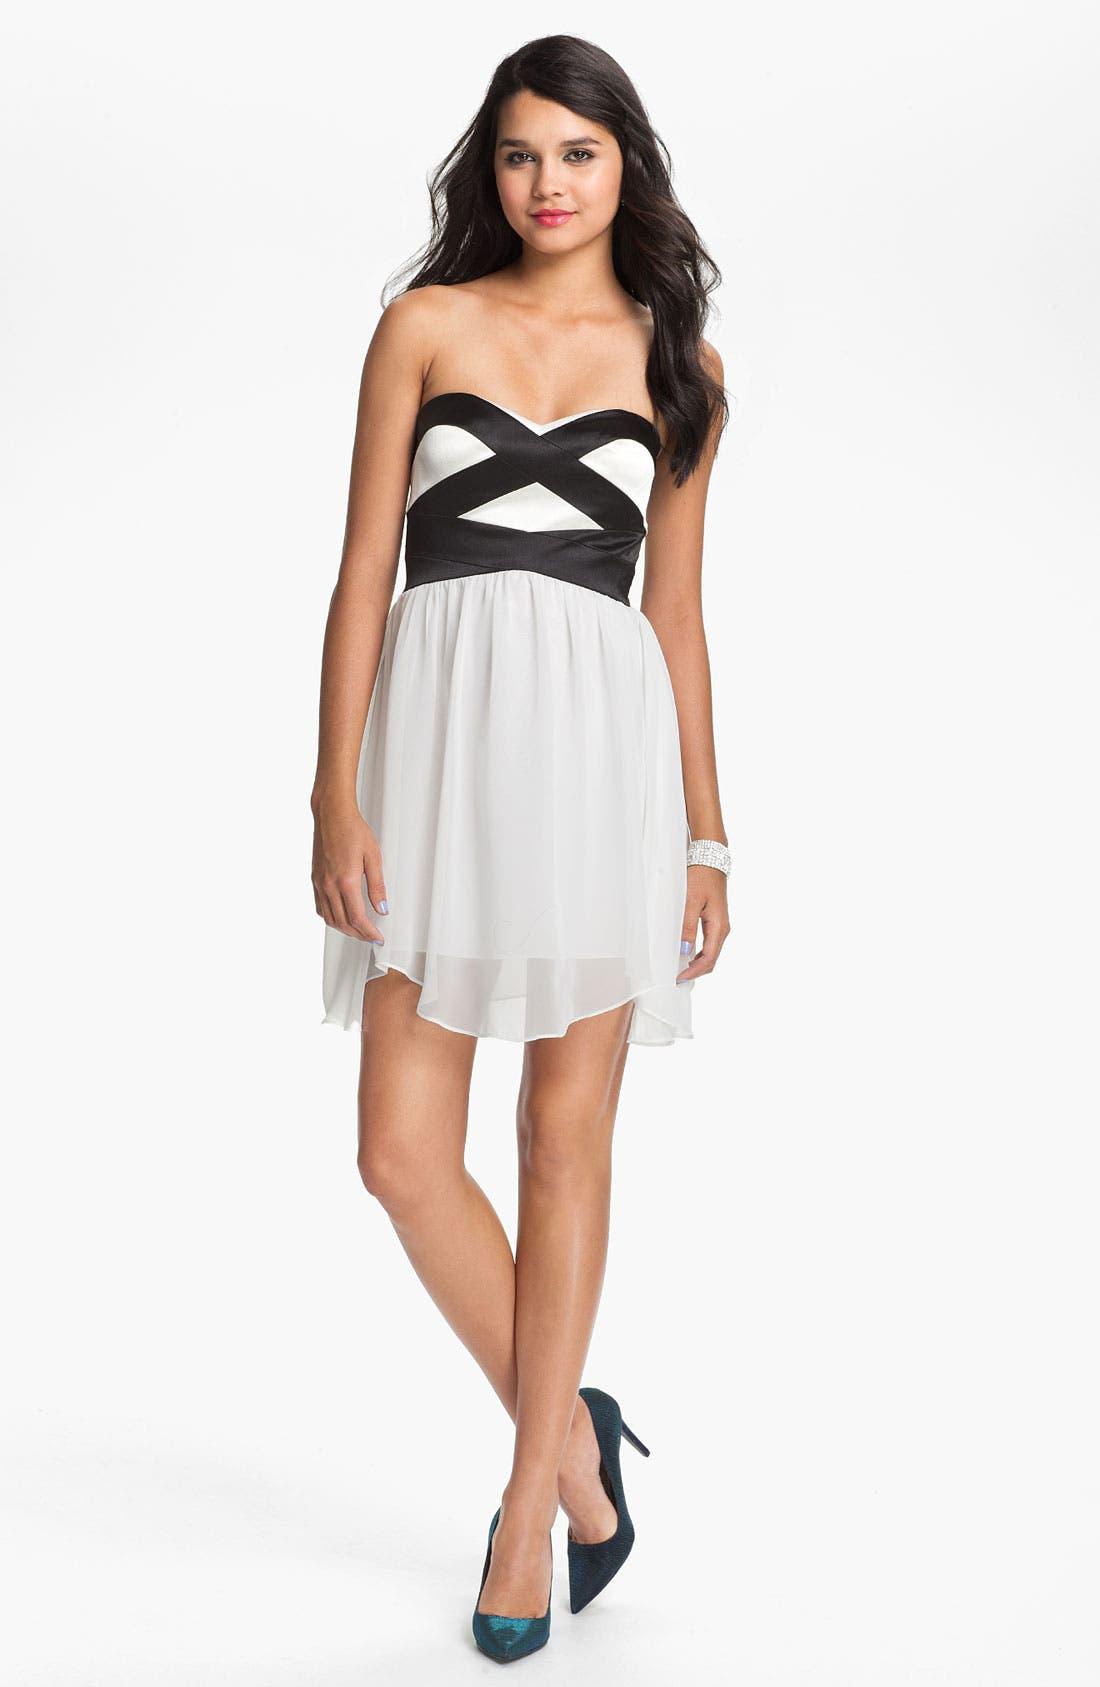 Alternate Image 1 Selected - Hailey Logan Sweetheart Chiffon Dress (Juniors) (Online Only)